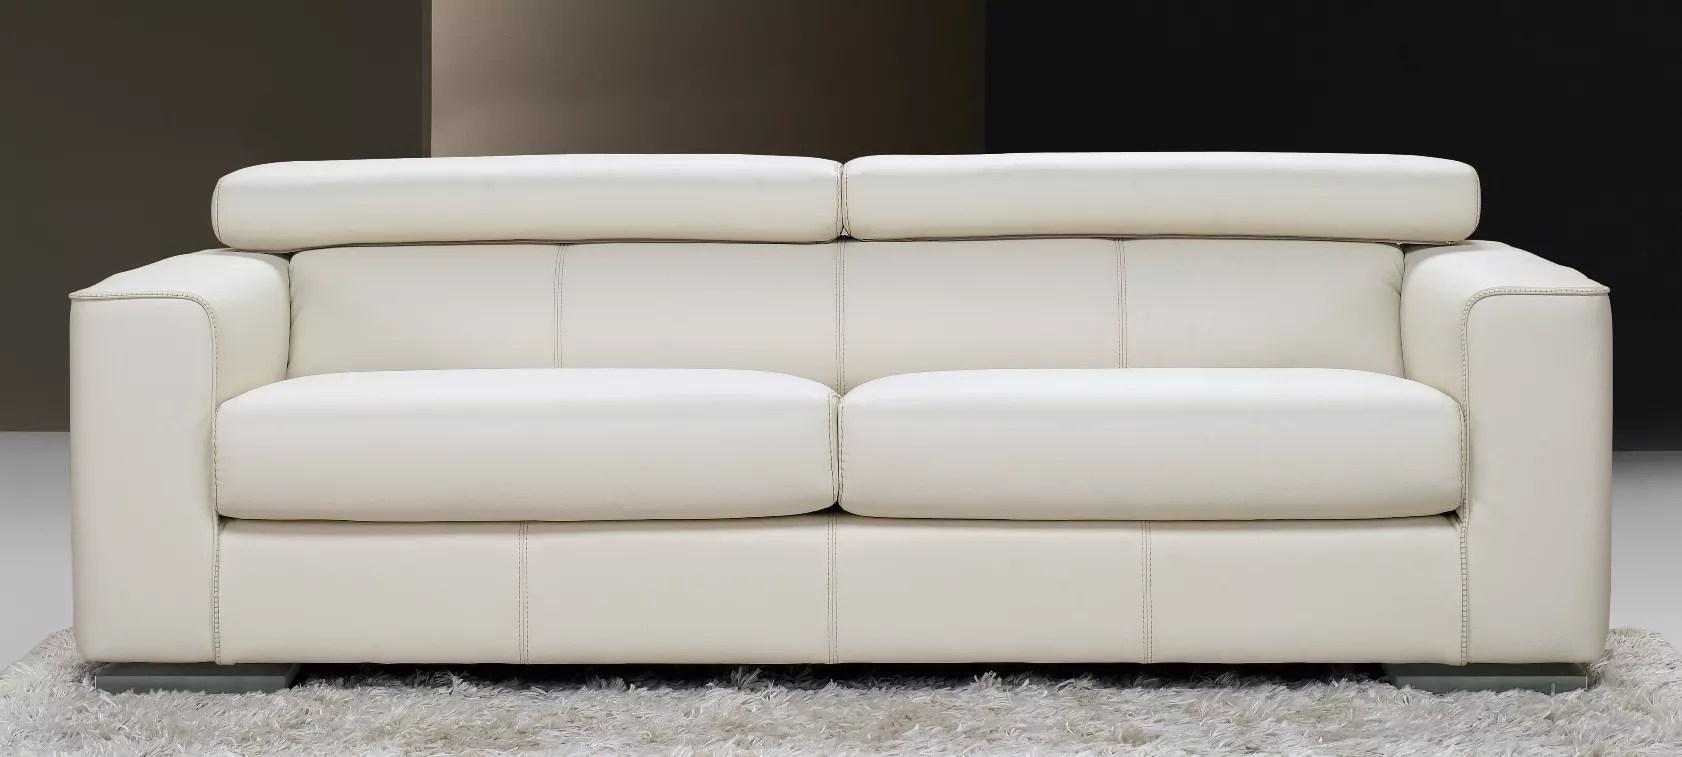 Modern Luxury Sofas Luxury Contemporary Furniture Ideas